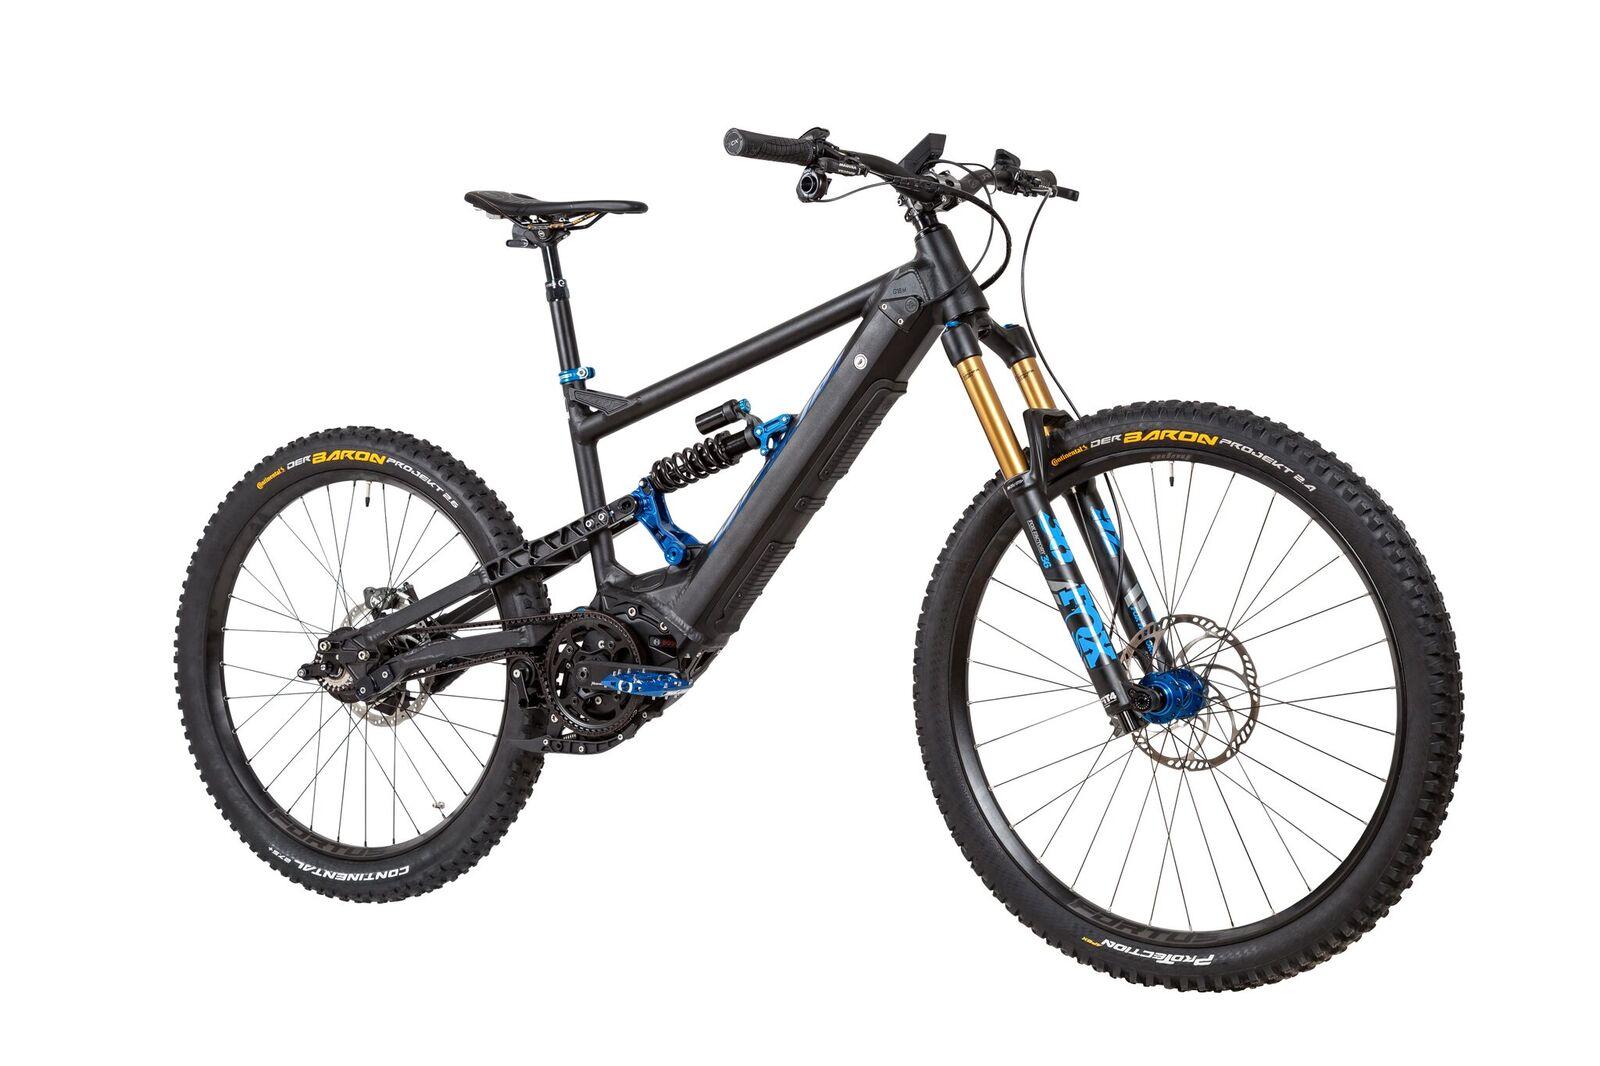 Nicolai G1 Eboxx E14 Electric Mountain Bike W Rohloff